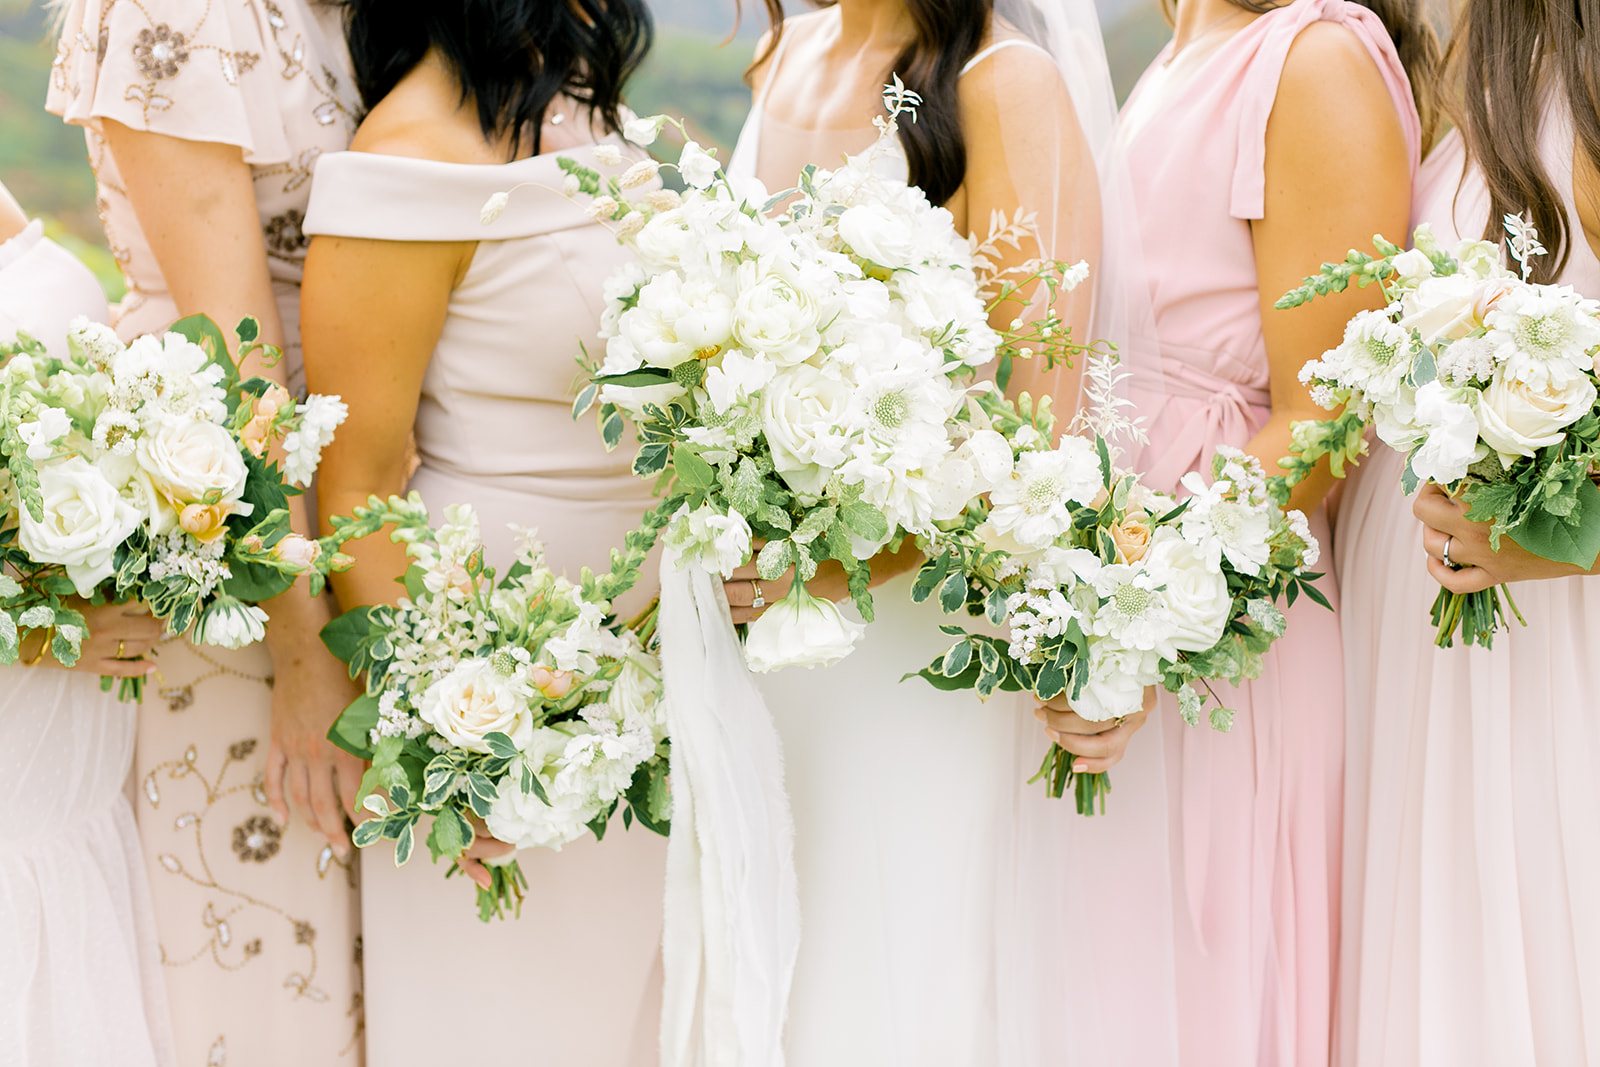 Ben & Emma's Wedding - Natalie Schutt Photography - Penelope Pots Floral.jpg